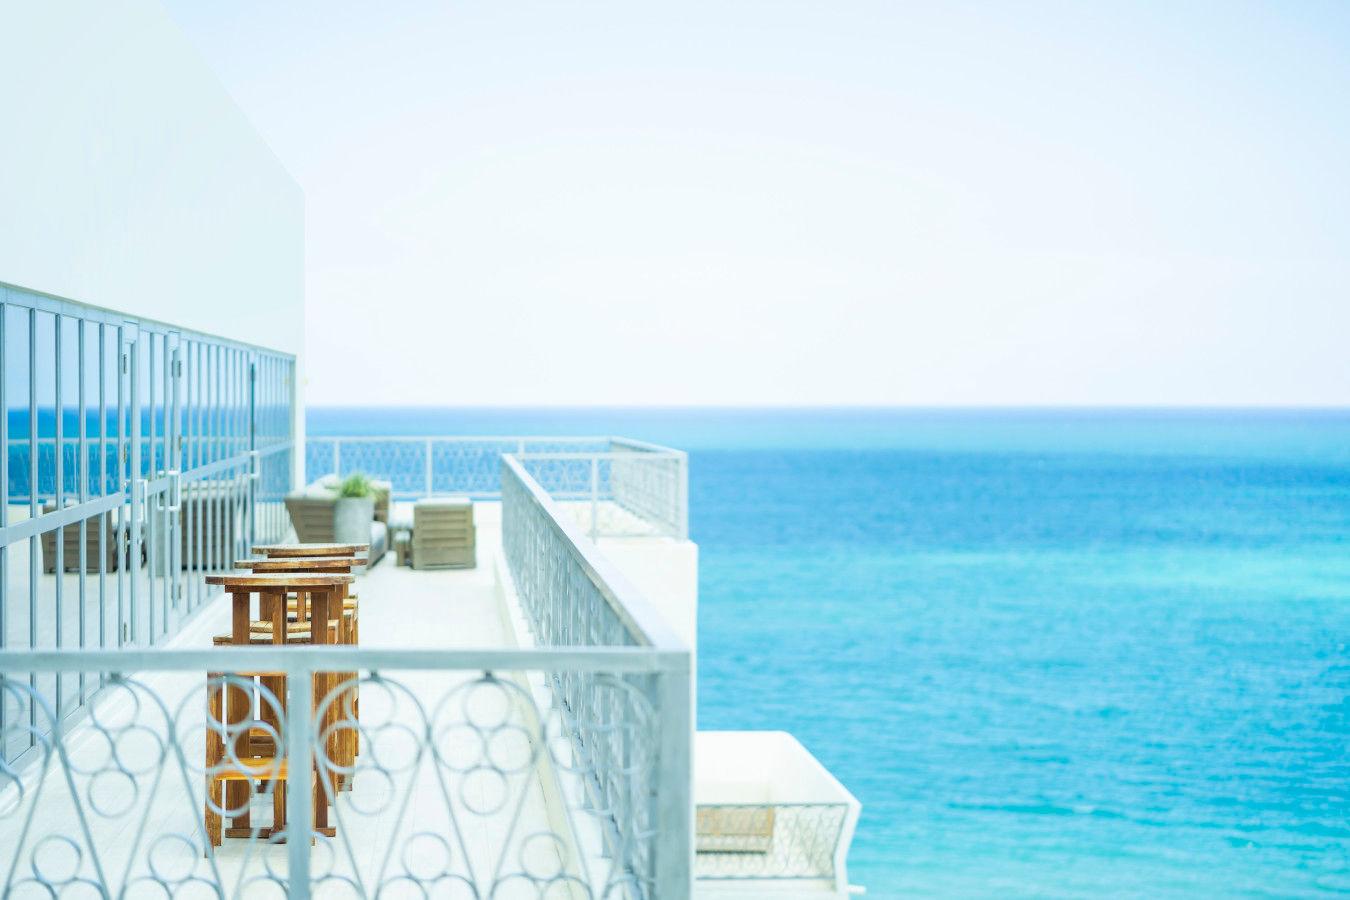 Nobu Villa - Nobu Villa Miami Beach